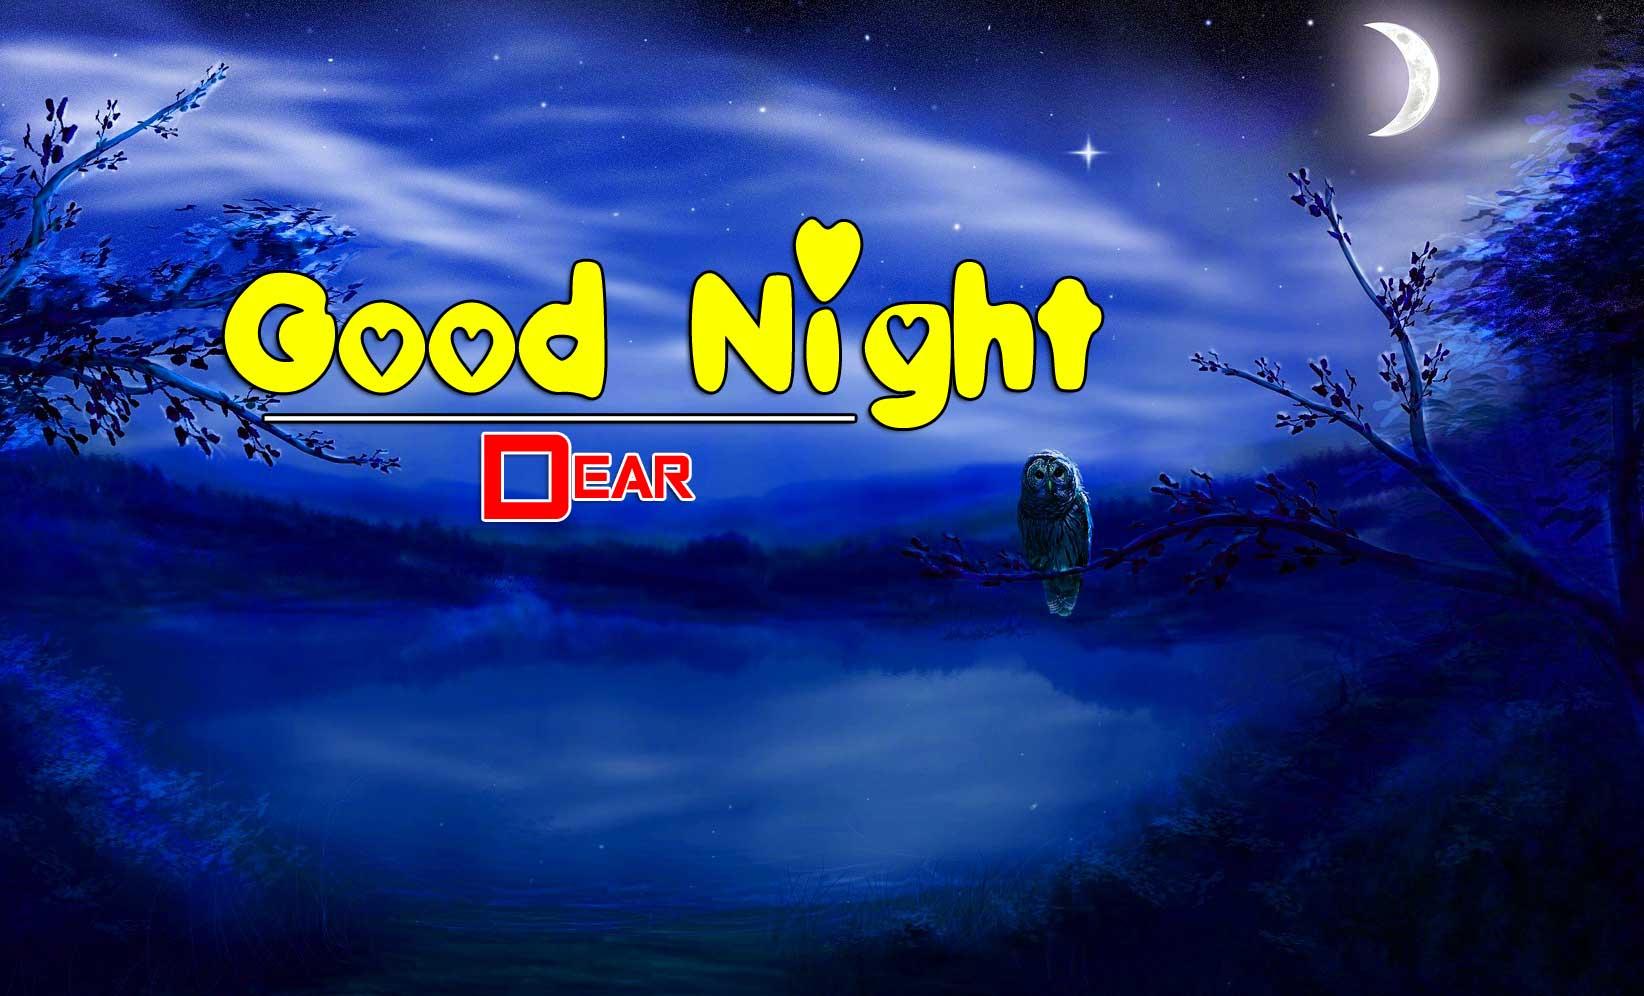 Full HD Good Night Pics Images